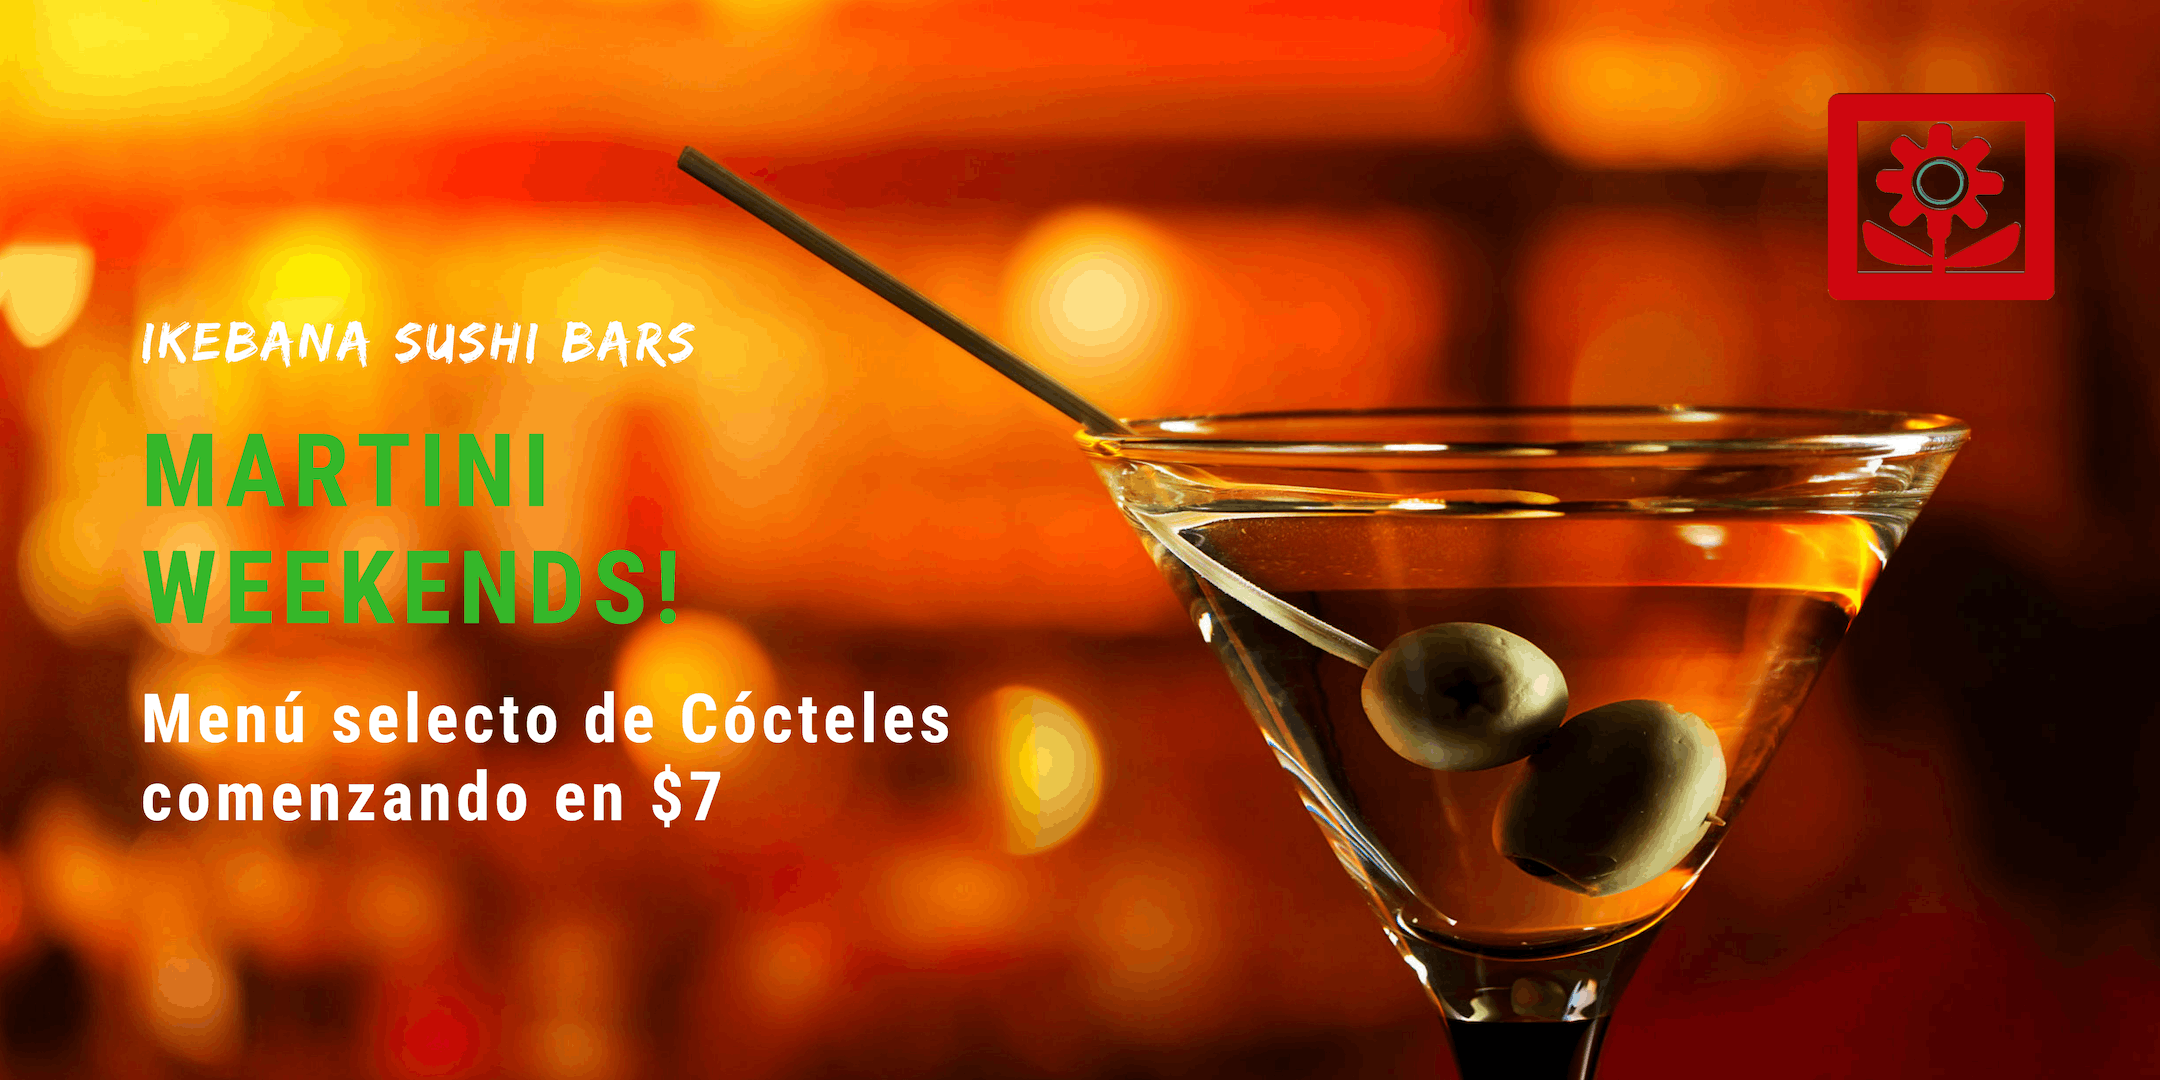 Martini Weekends Ikebana Sushi Bar Guaynabo